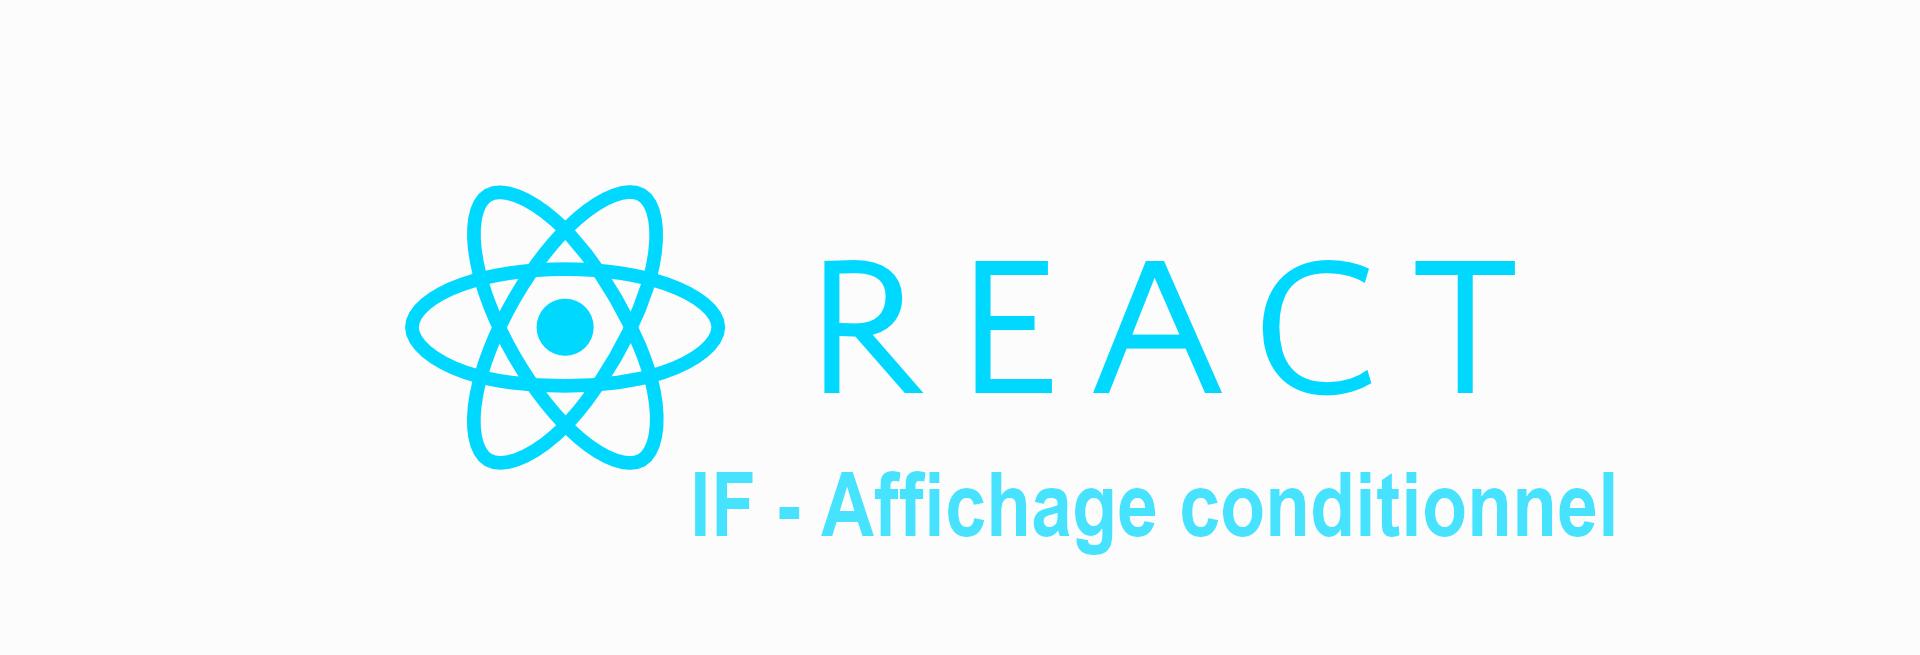 react affichage conditionnel